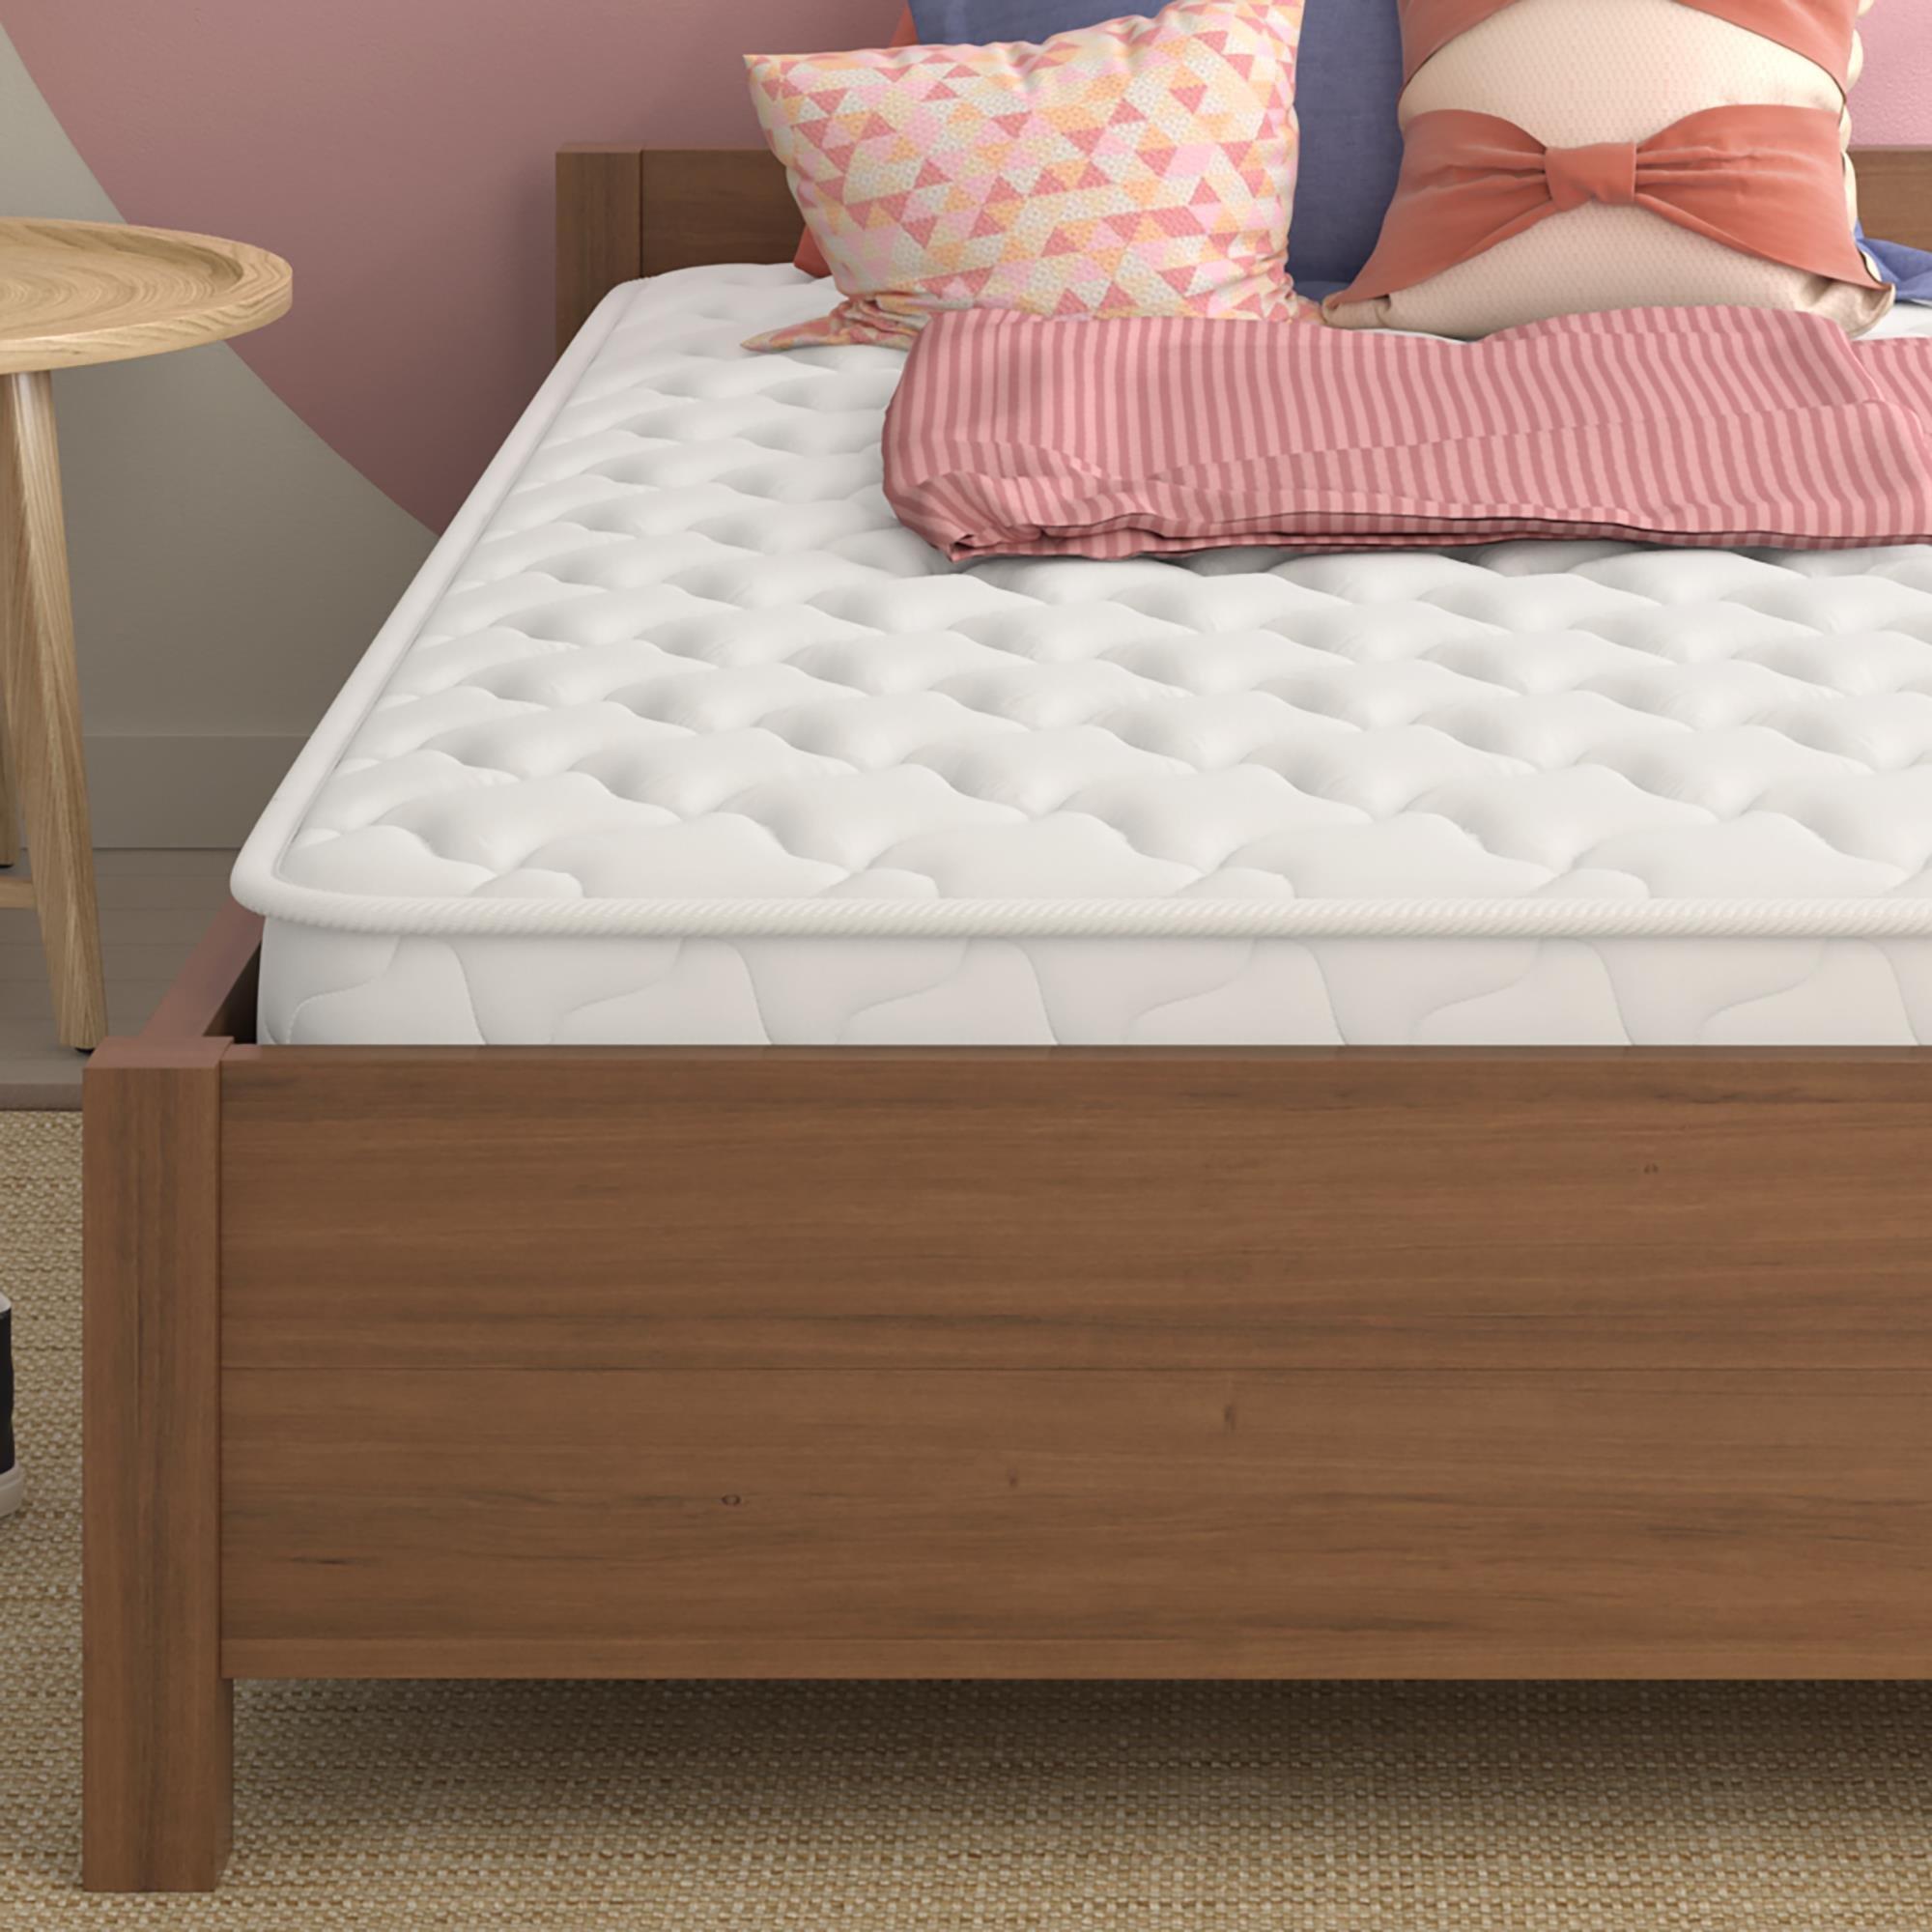 Signature Sleep Mattress, Twin Mattress, 6 Inch Hybrid Coil Mattress, White, Twin